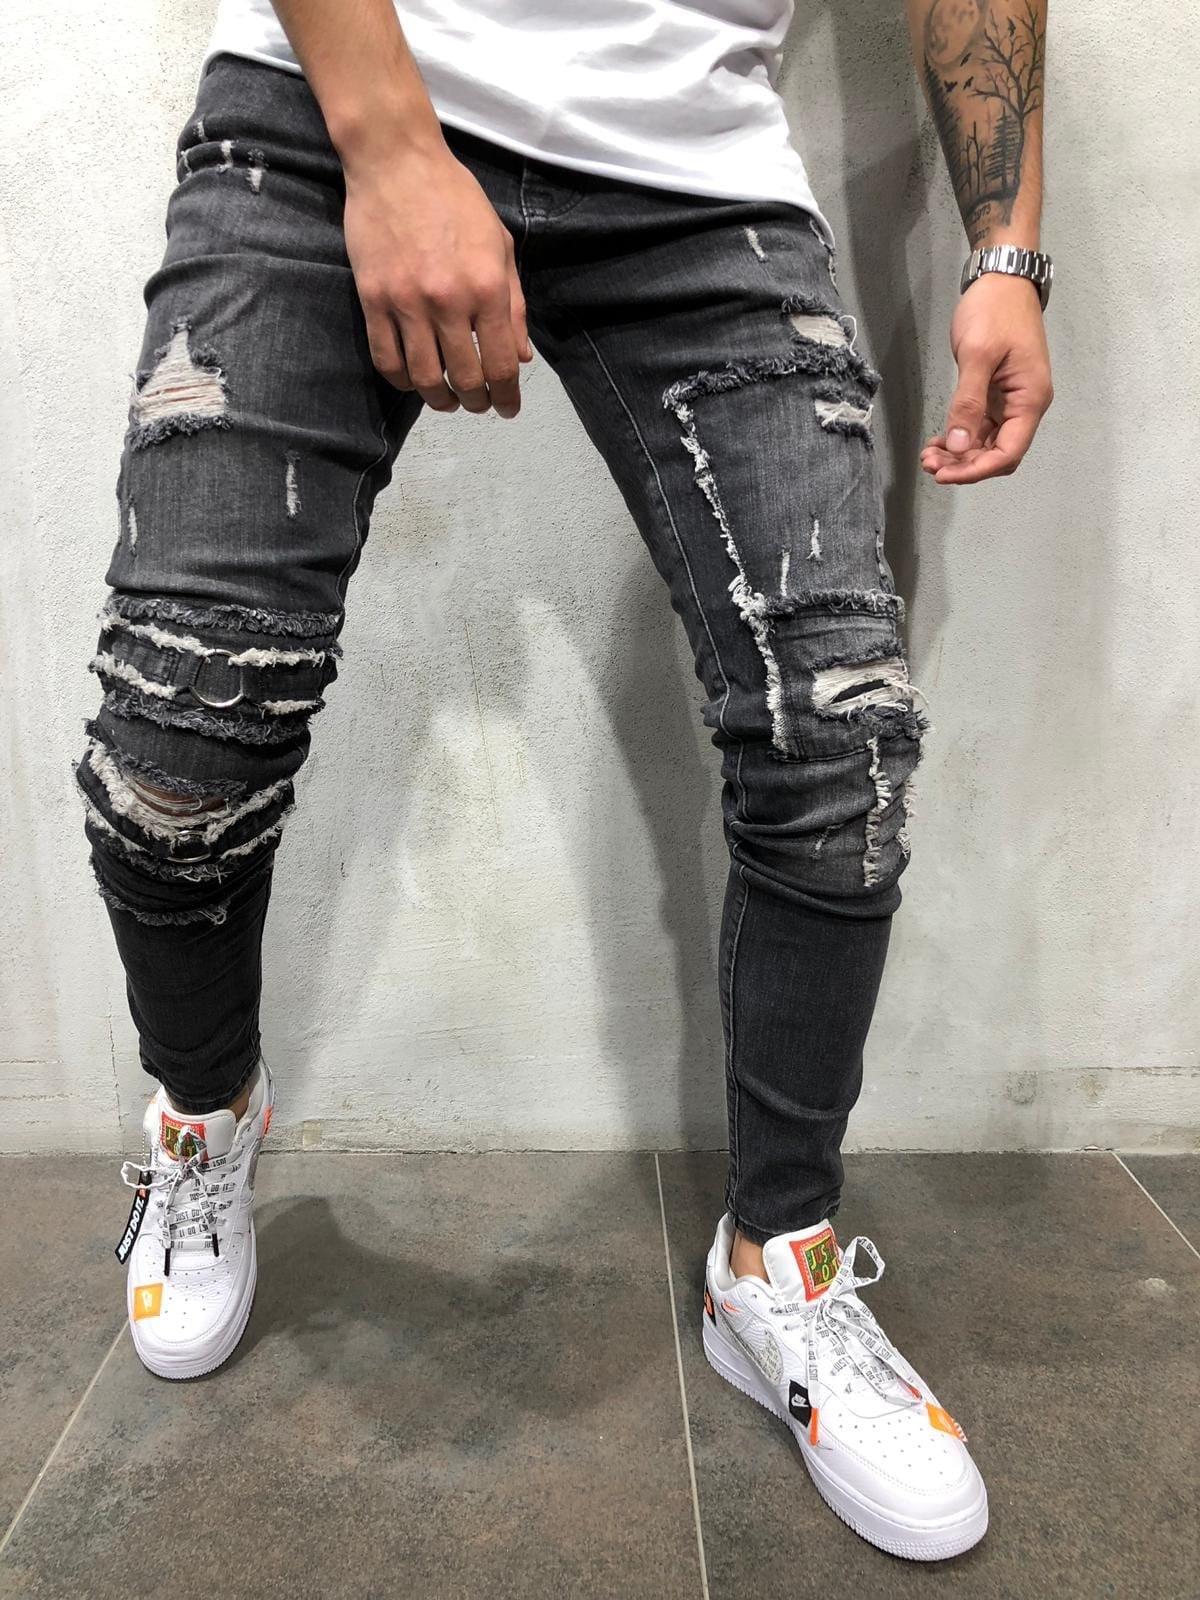 New Pantalones Rotos Para Hombres Mens Fashion Pantalones De Hombre Rotos Hole Gray Jeans Man Slim Super Skinny Jeans Men Pants Jeans Aliexpress